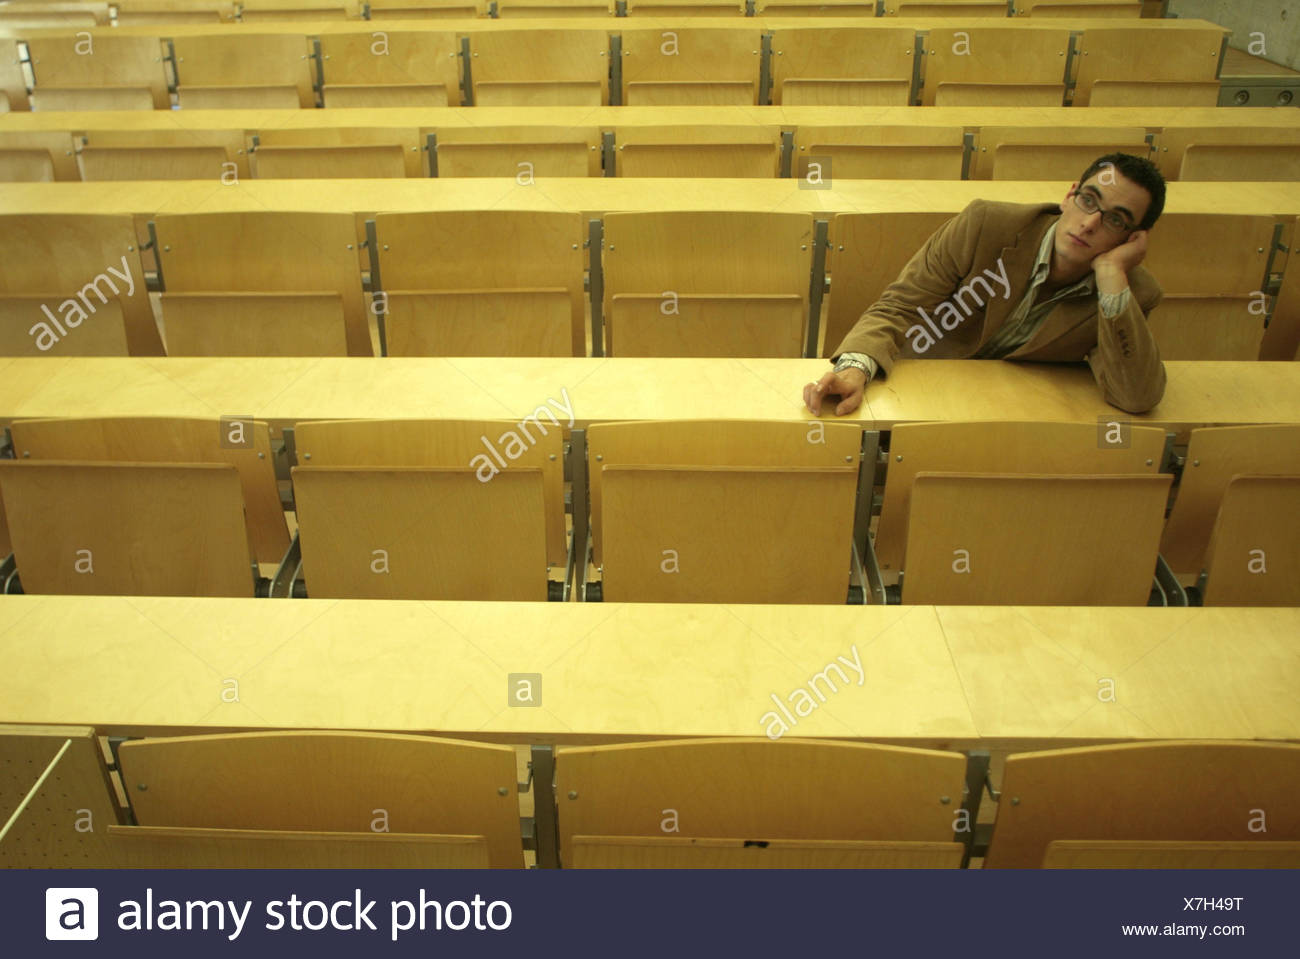 Auditorium, student, only, boredom, wait university, university, college, advanced technical college, study, man, head rest on, punctuality, Überpünktlichkeit, delay, student mangle, professor's mangle, lack teachers, educational policy, disinterest, abse - Stock Image